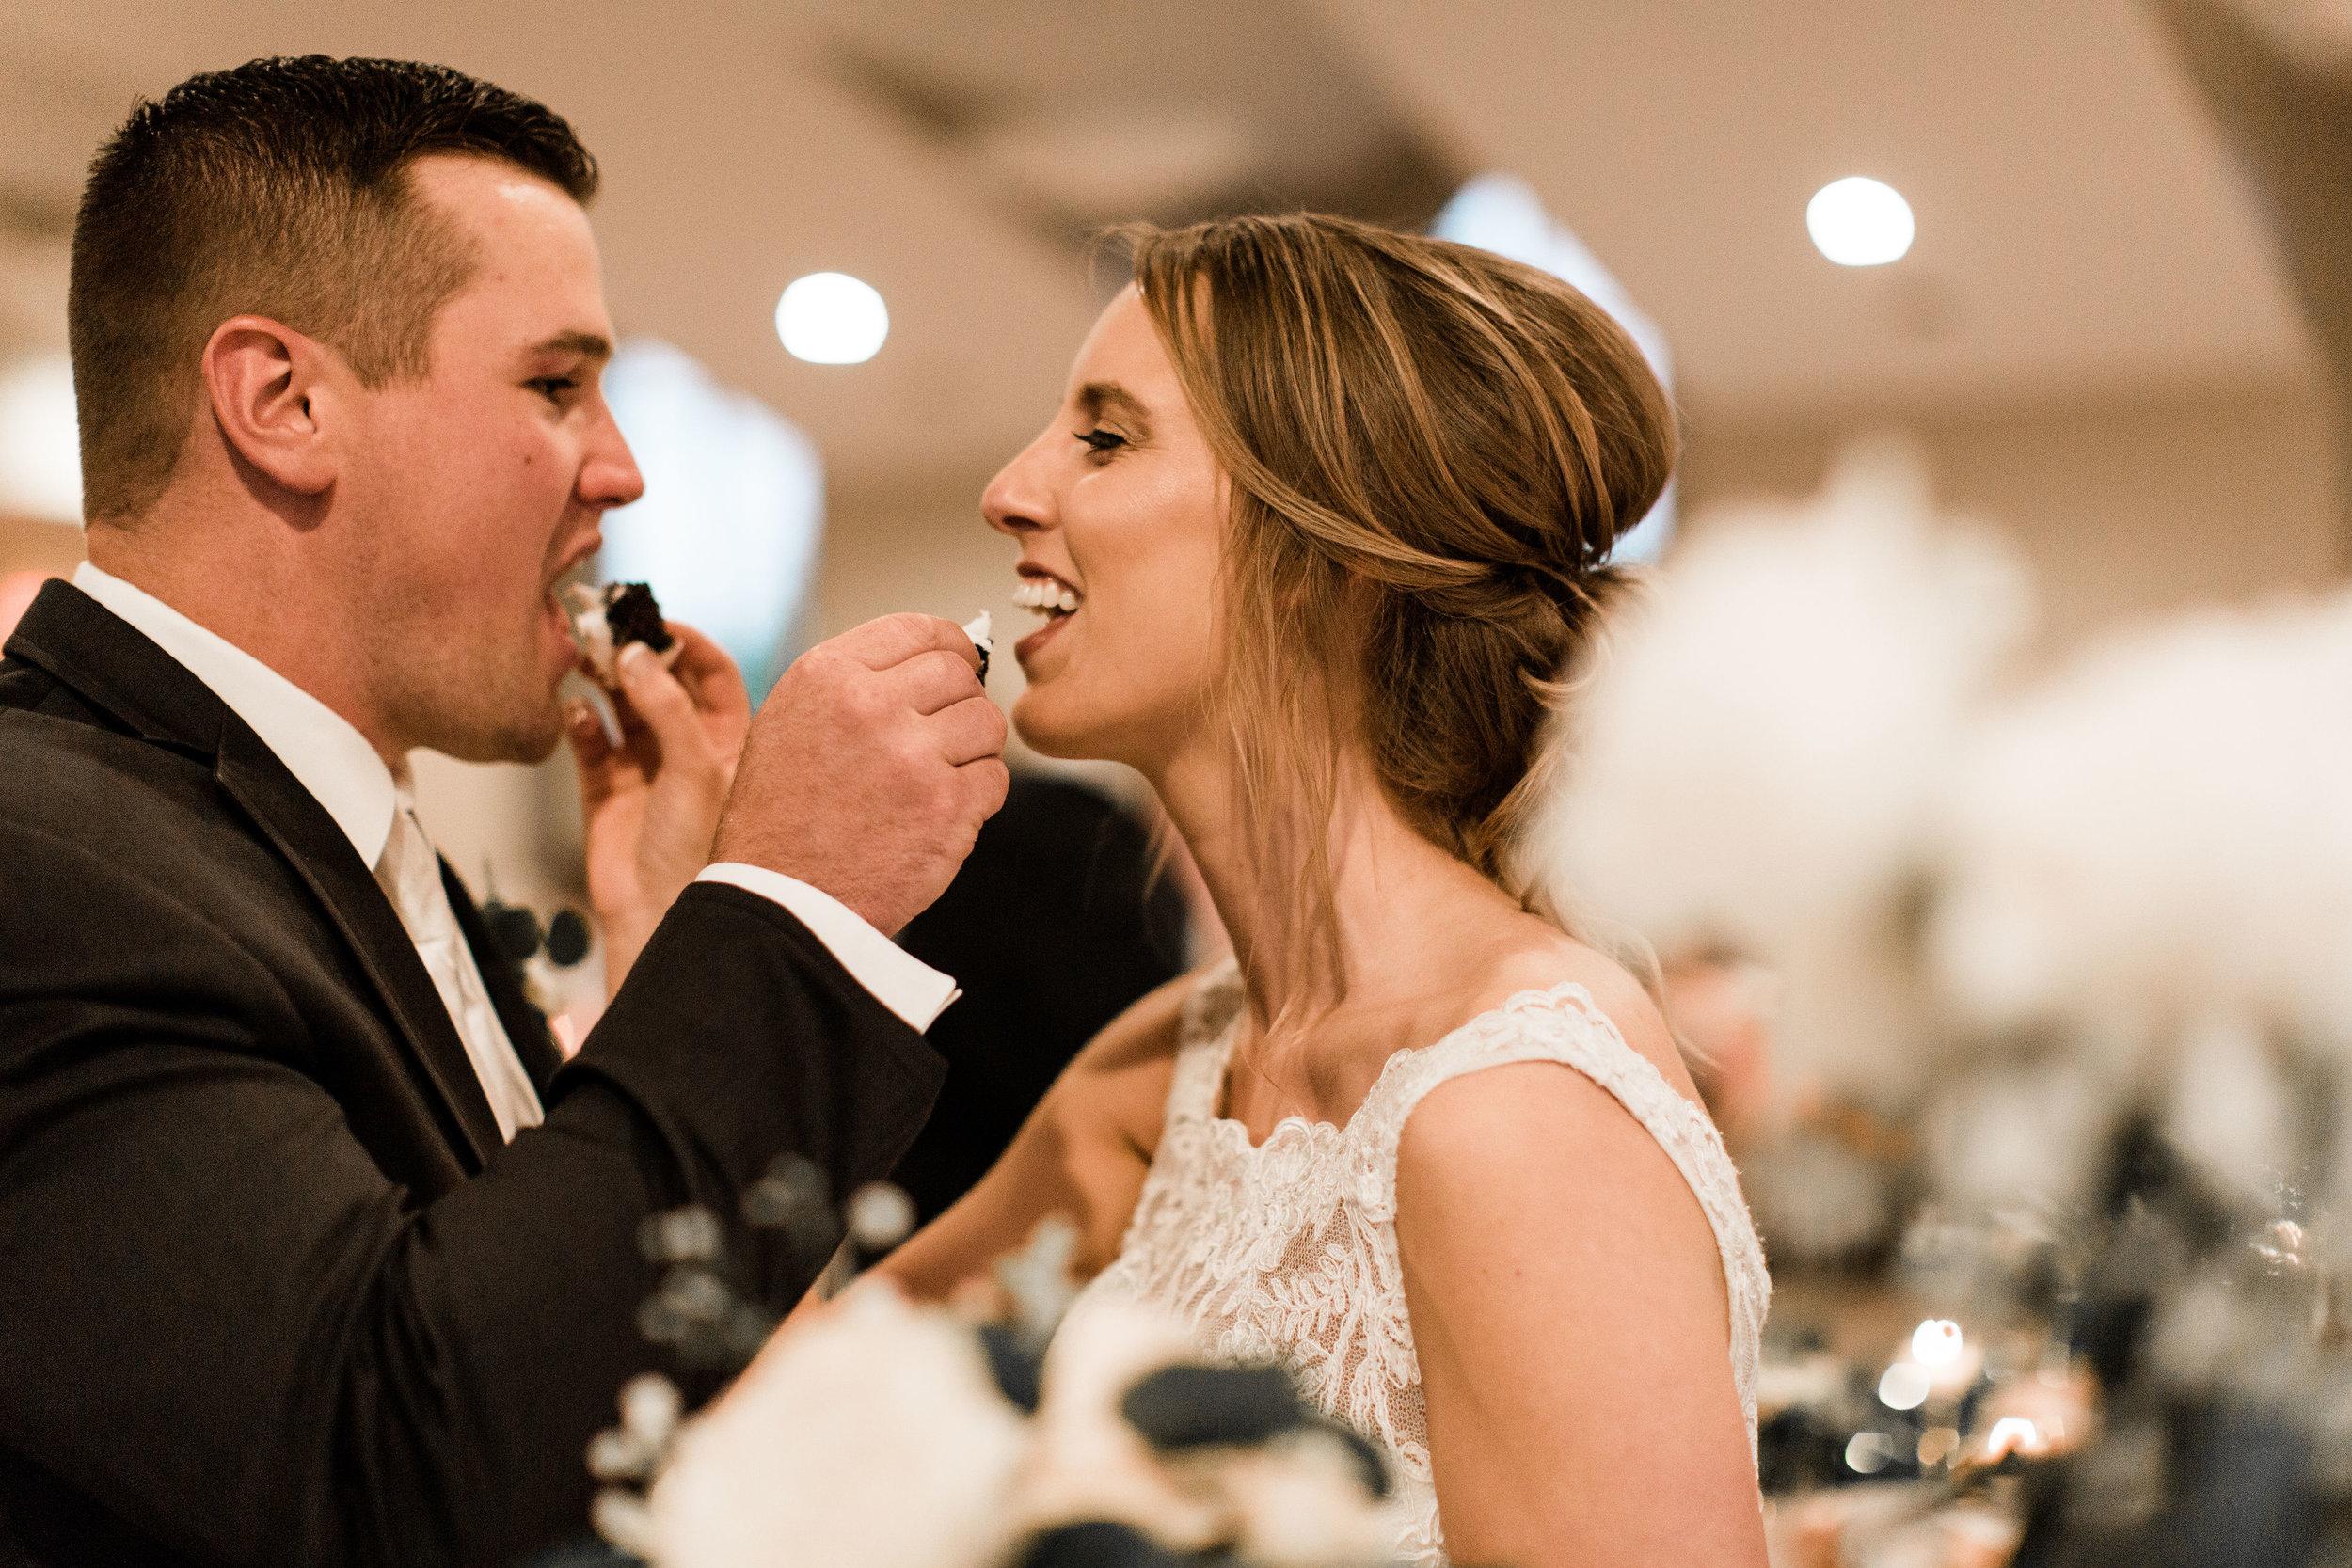 katie_graham_photography_luxury_fine_art_destination_wedding_photographer_bemus_point_chautauqua_institution_chautauqua_lake_mayville_lakewood_buffalo_new_york_erie_pennsylvania